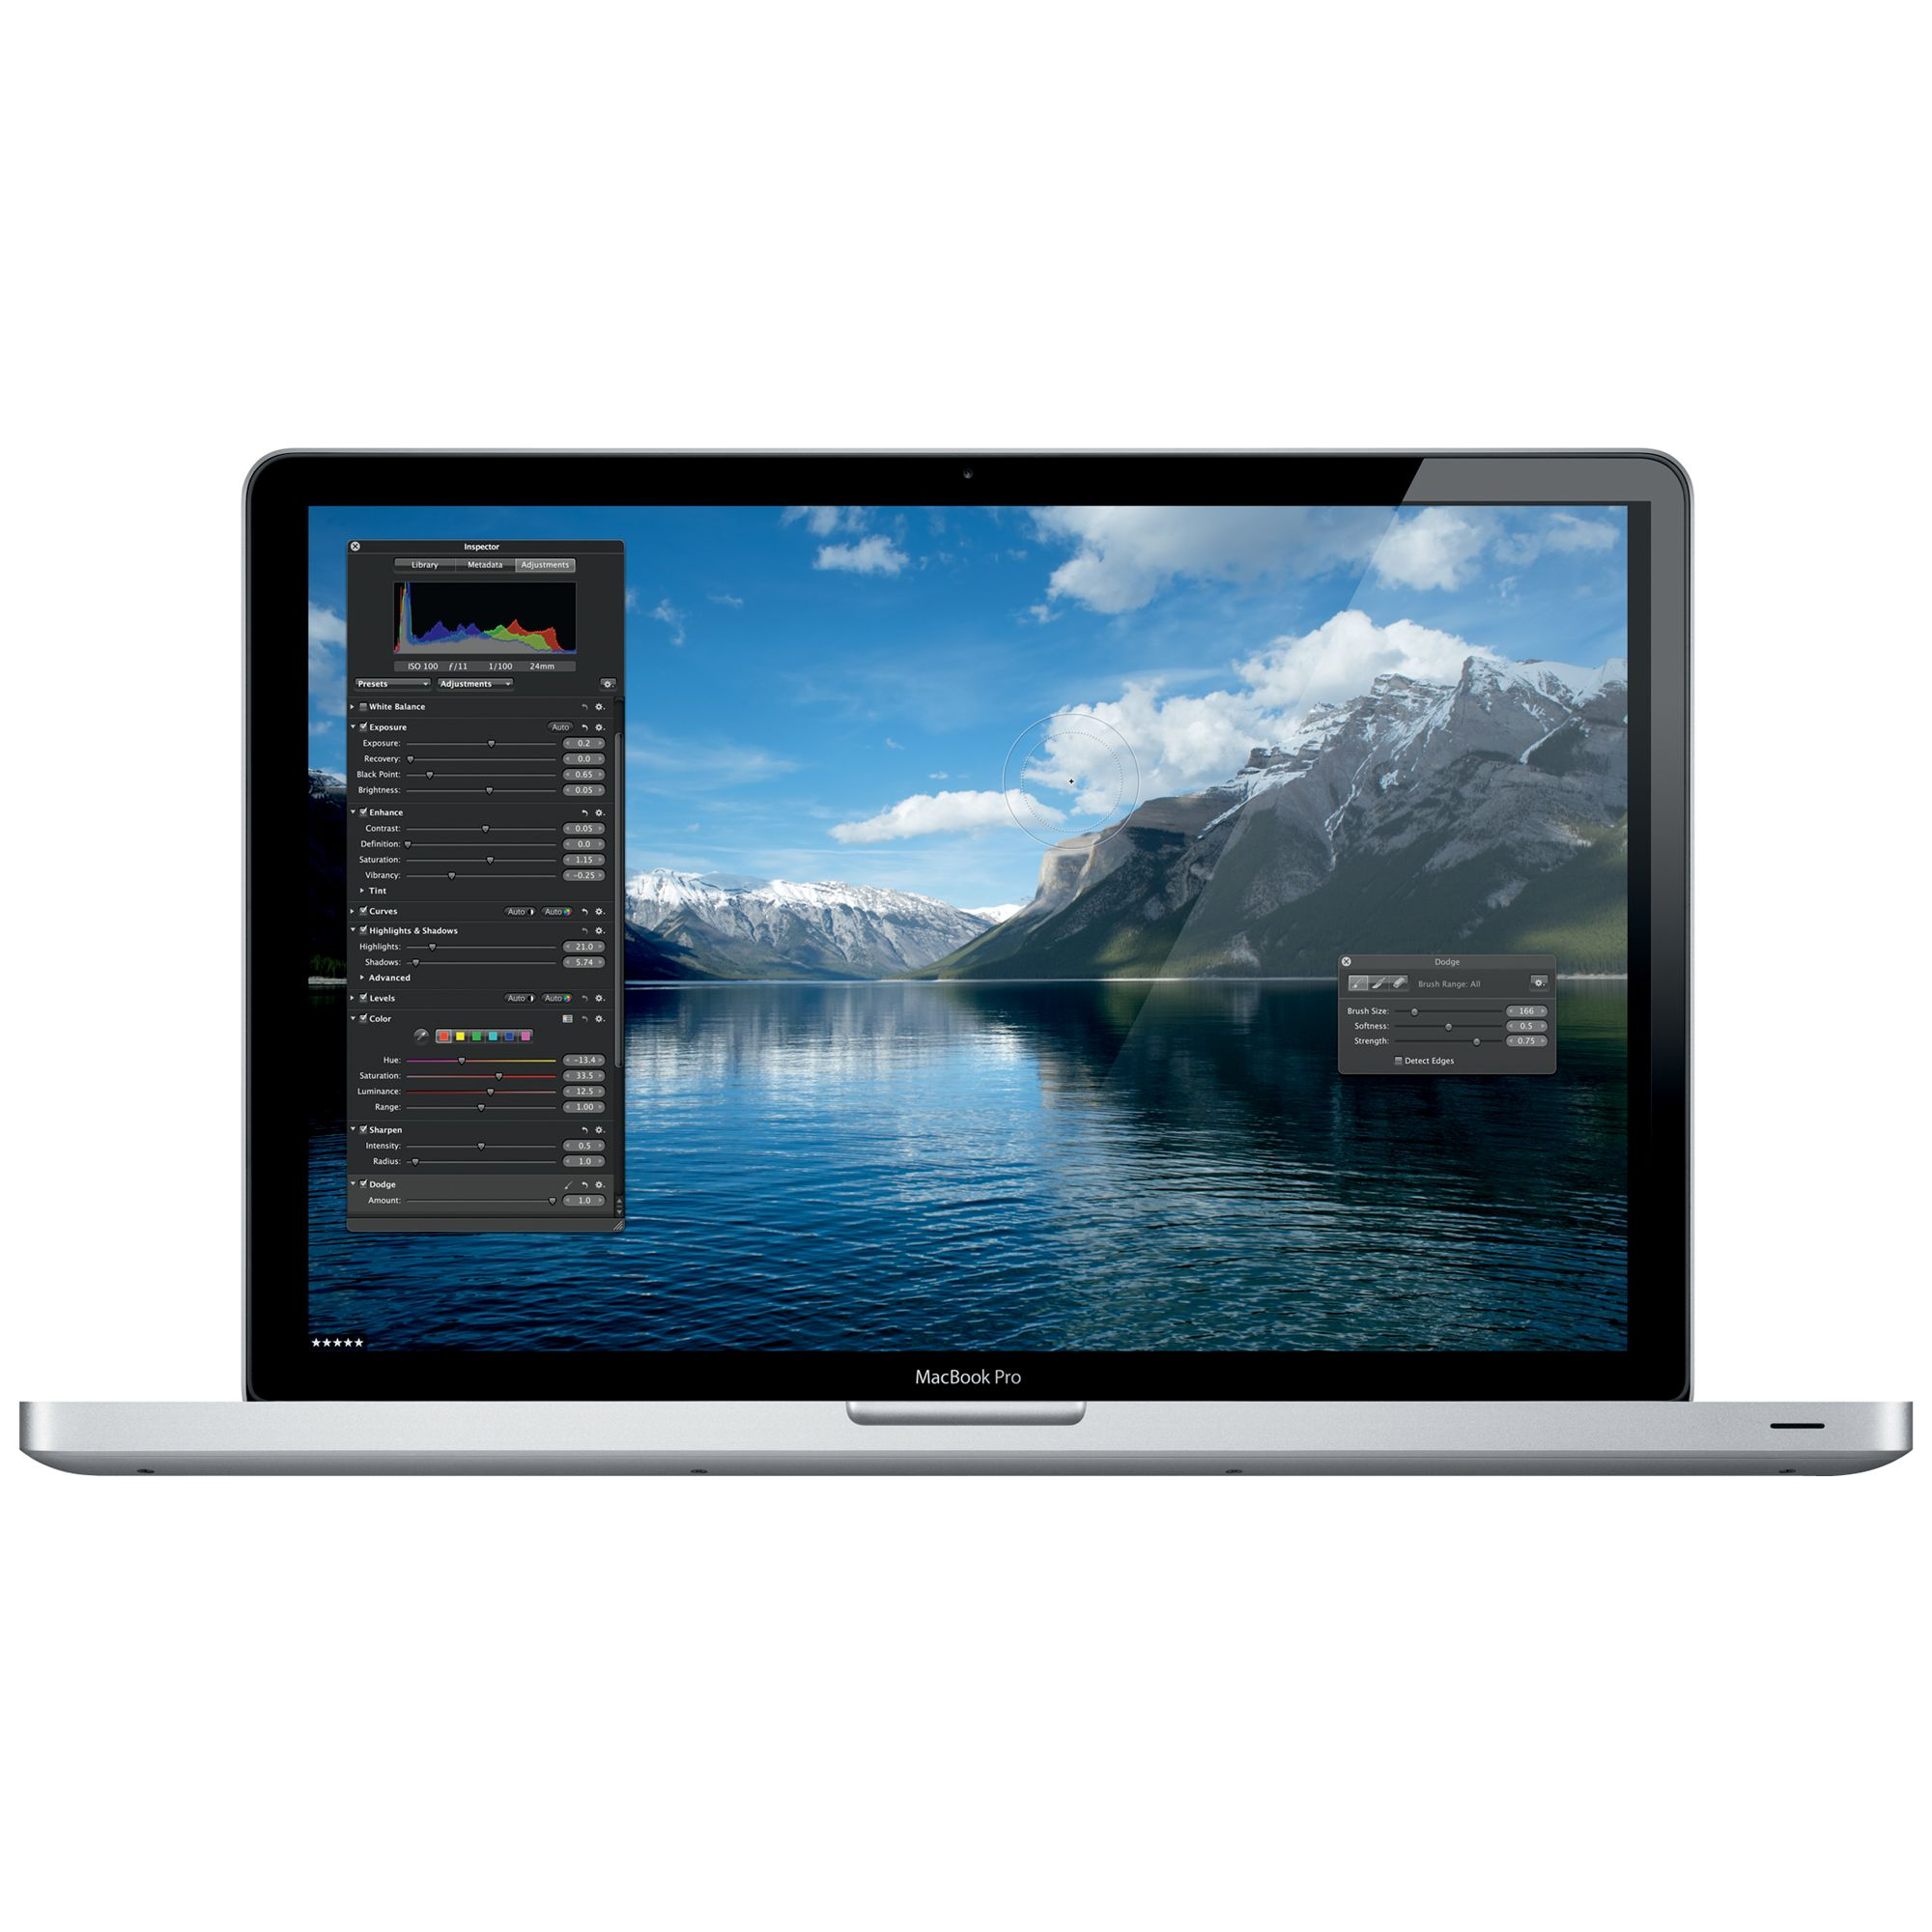 Certified Refurbished - Apple MacBook Pro MC700LL/A 13-Inch Laptop - 2.3Ghz Core i5 / 4GB RAM / 320GB